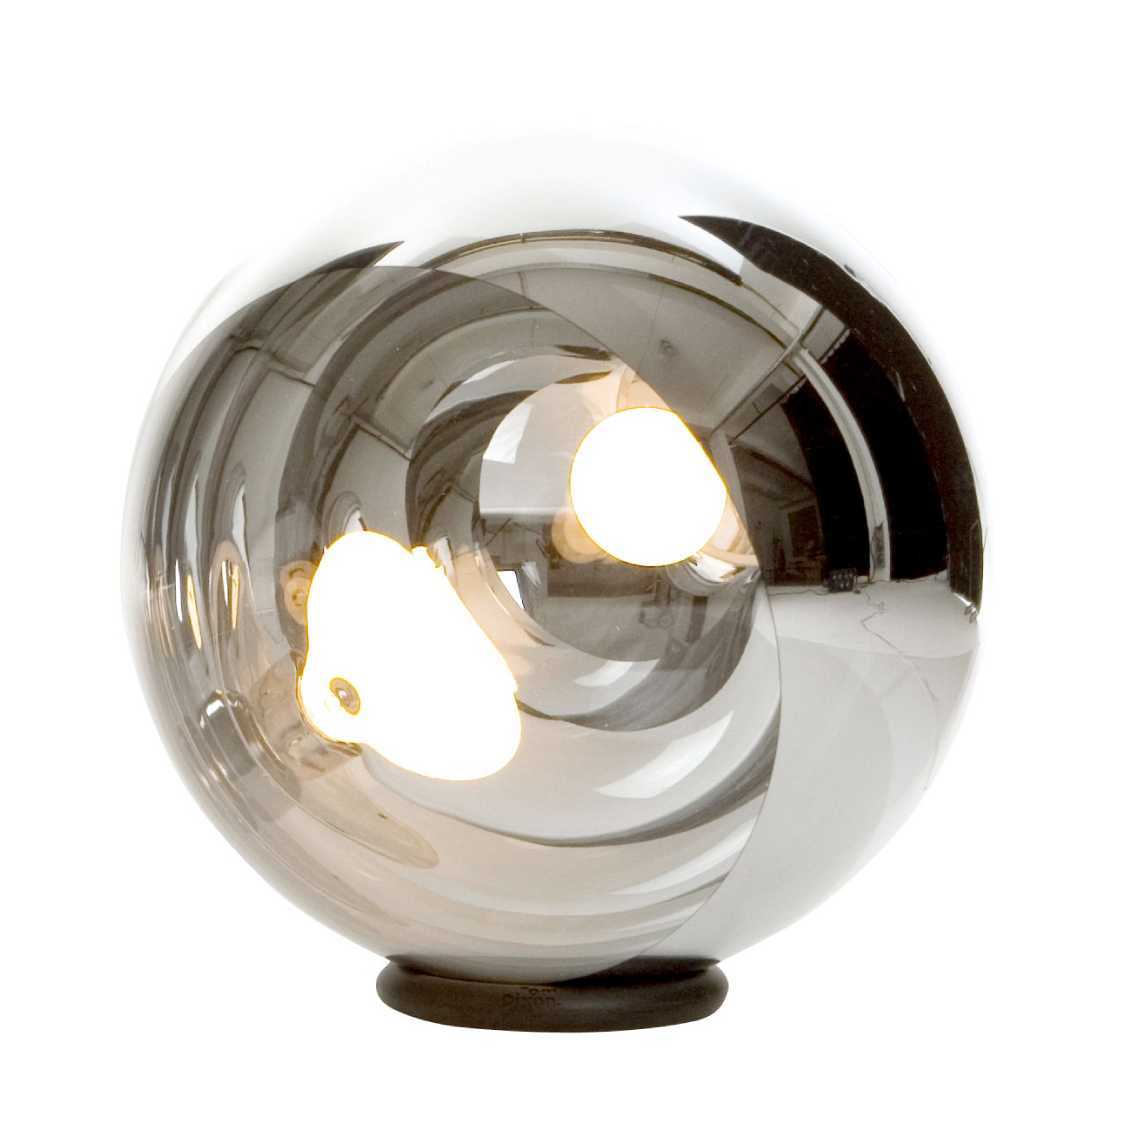 Tom Dixon Mirror Ball 40 cm vloerlamp